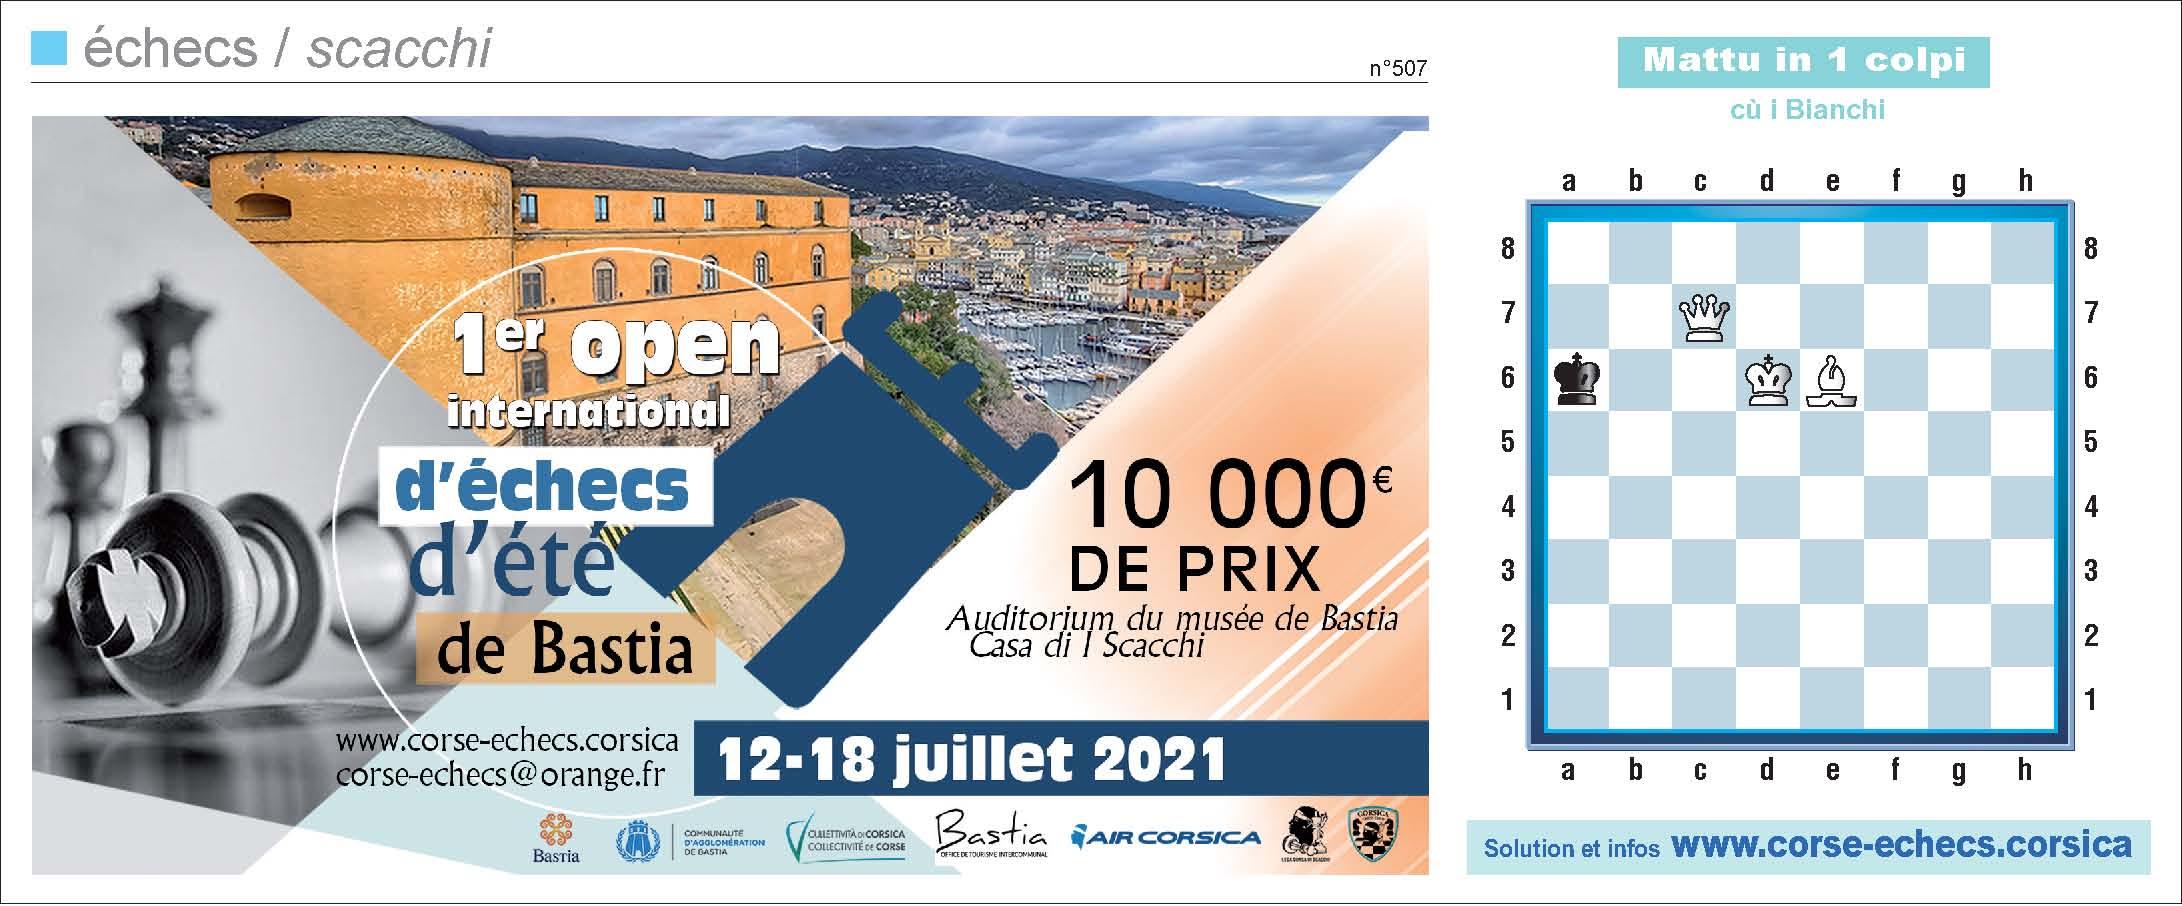 Corse-Matin du 11 juillet 2021